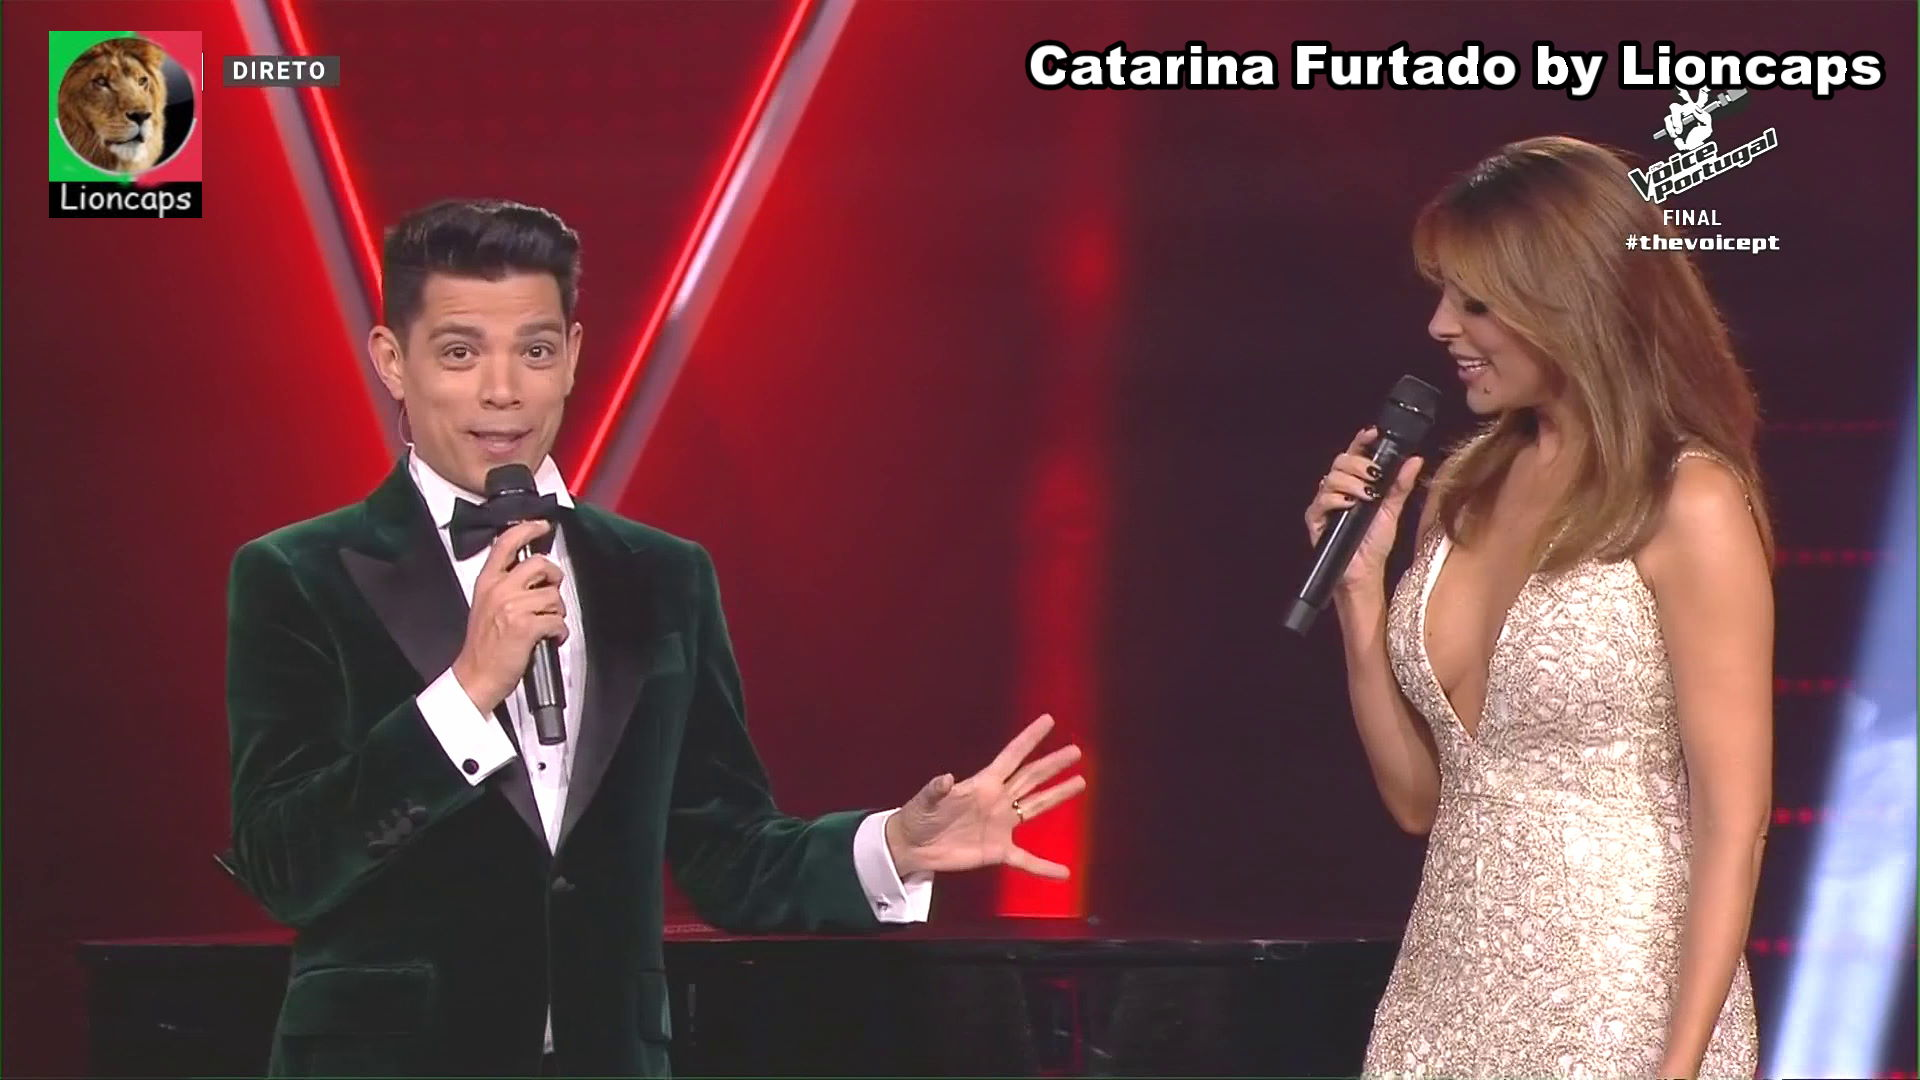 632058580_catarina_furtado_vs200122_0019_122_461lo.JPG